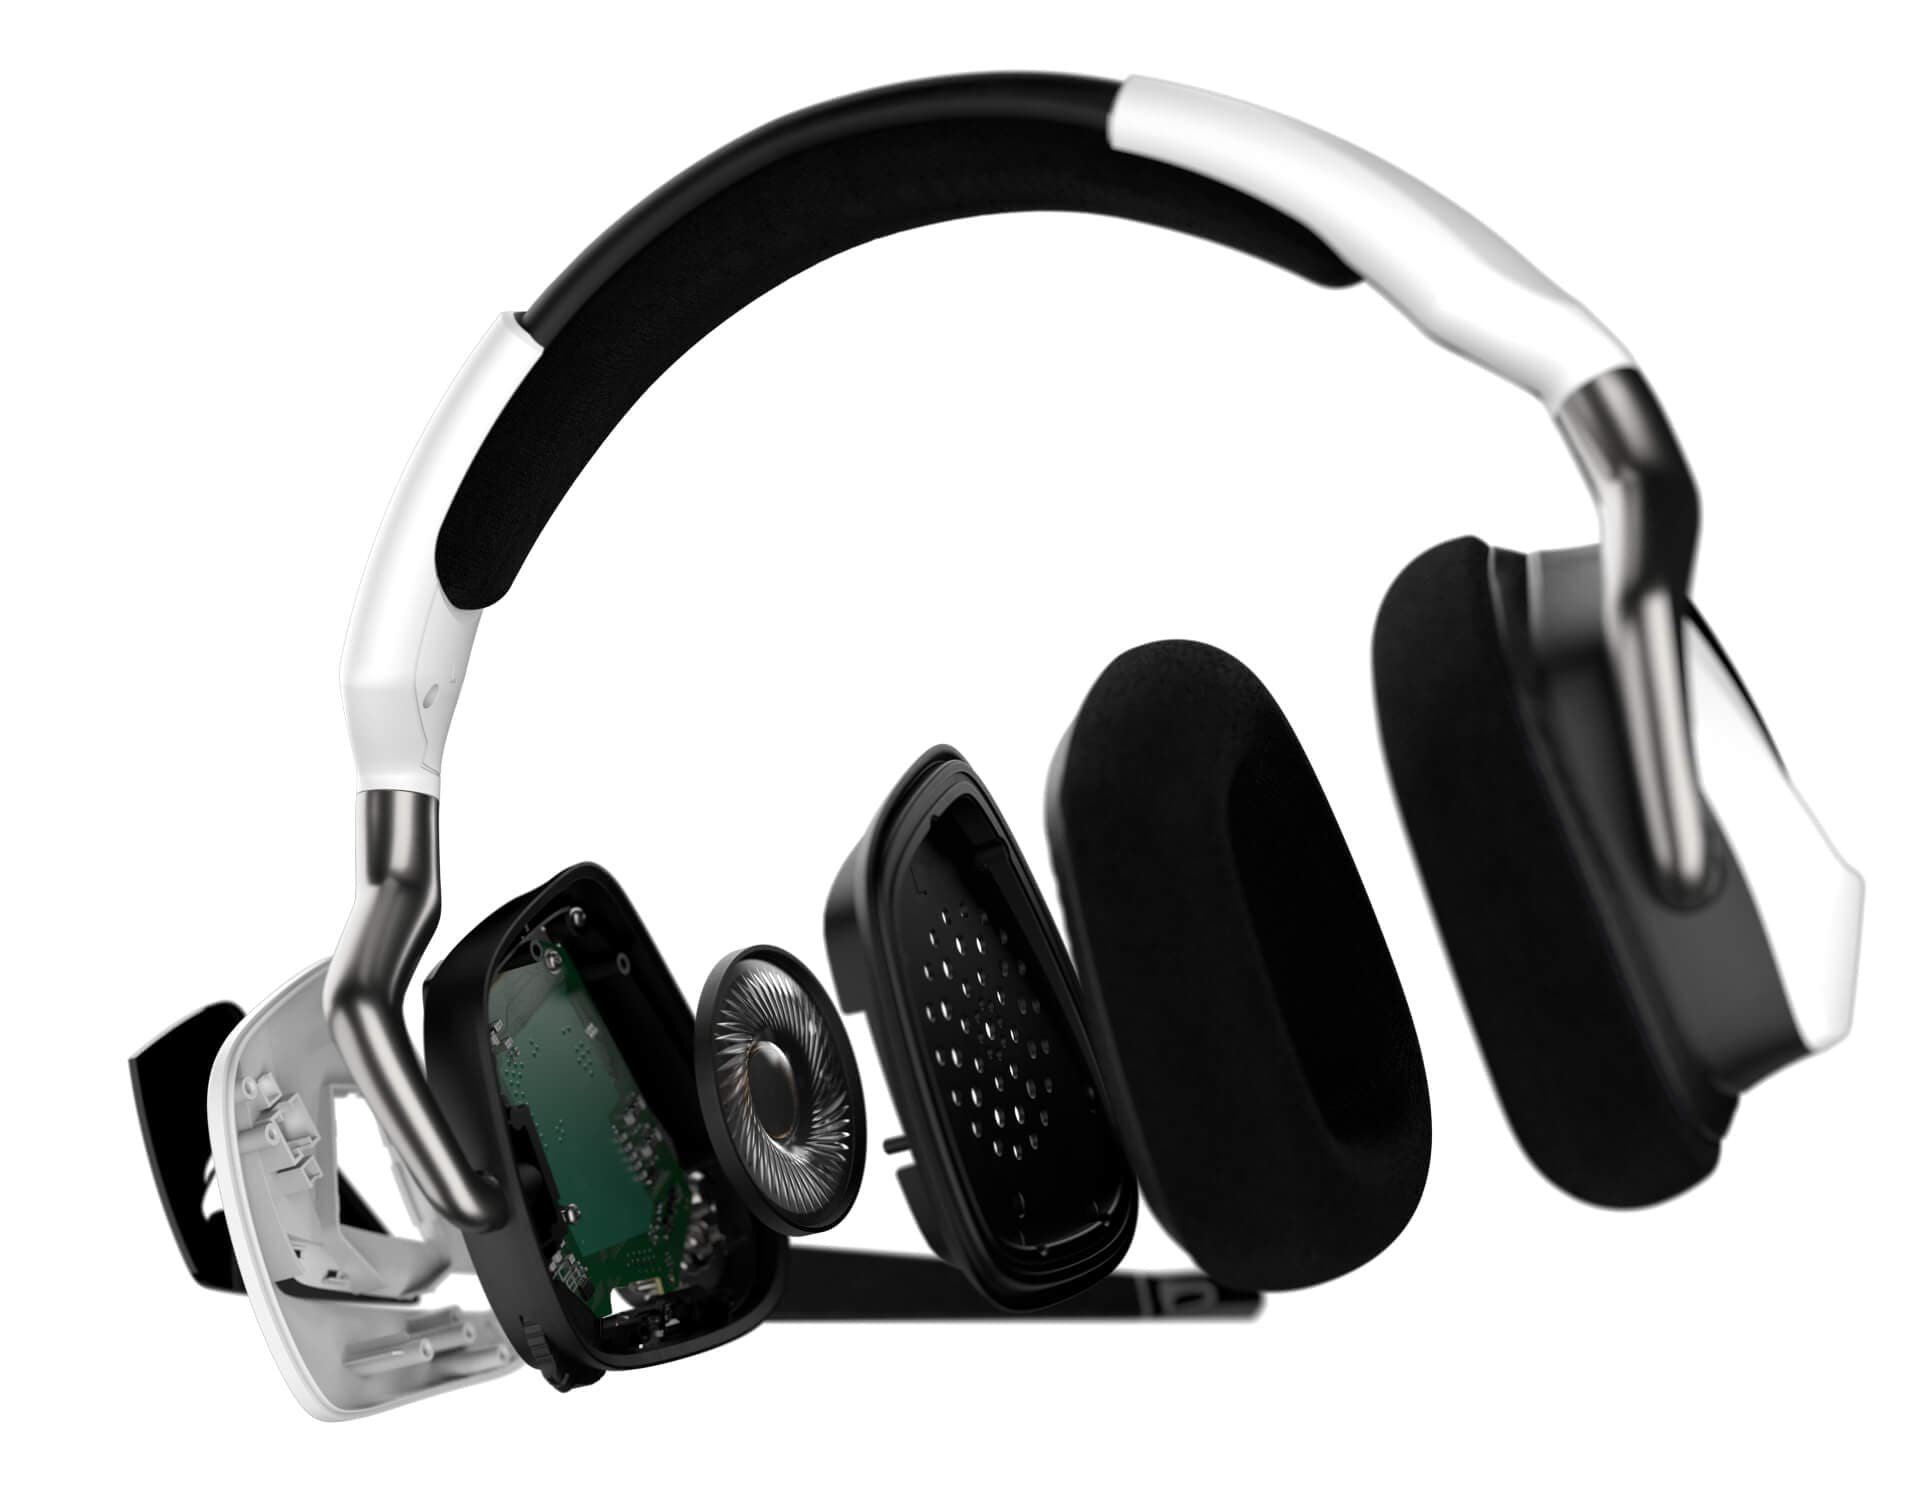 Corsair VOID RGB ELITE USB Premium Gaming Headset with 7.1 Surround Sound — Carbon 18